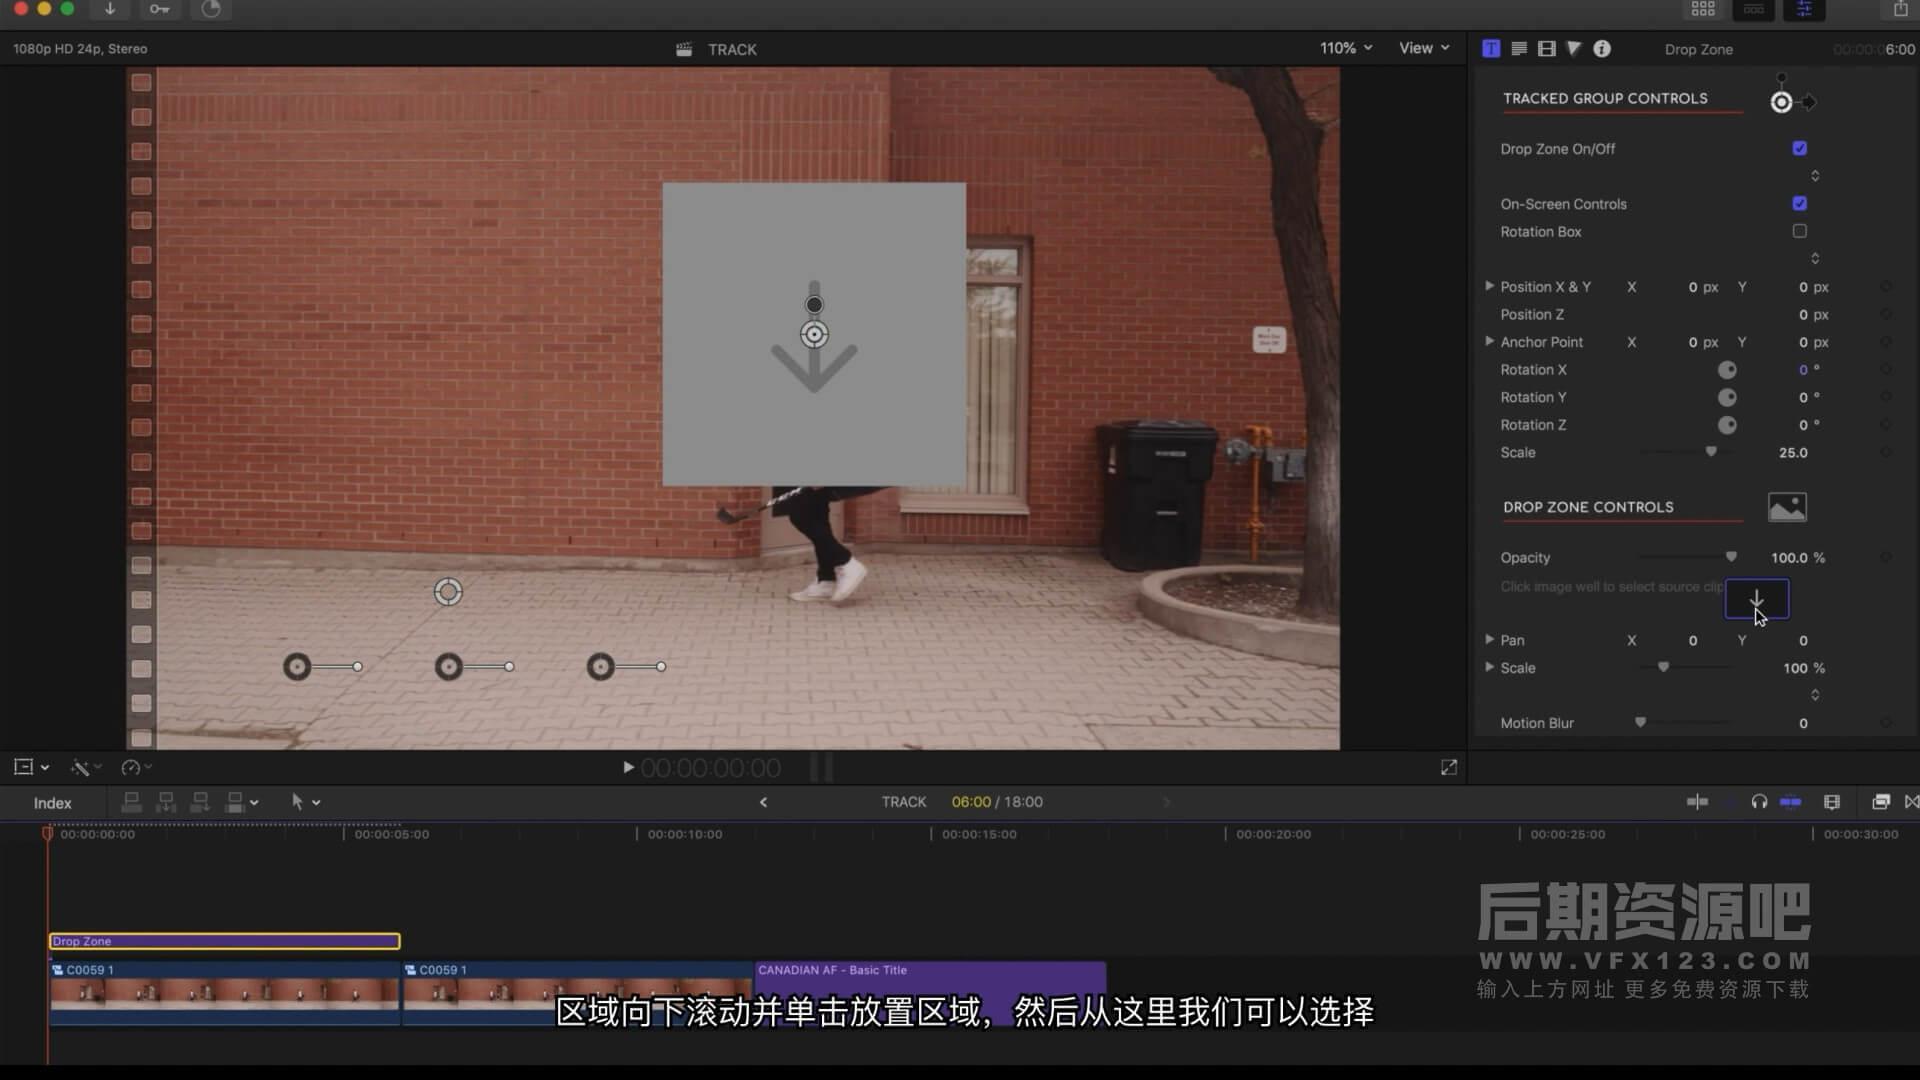 fcpx自动跟踪插件 fcpx Auto Tracker 2.2 使用参考 中文字幕